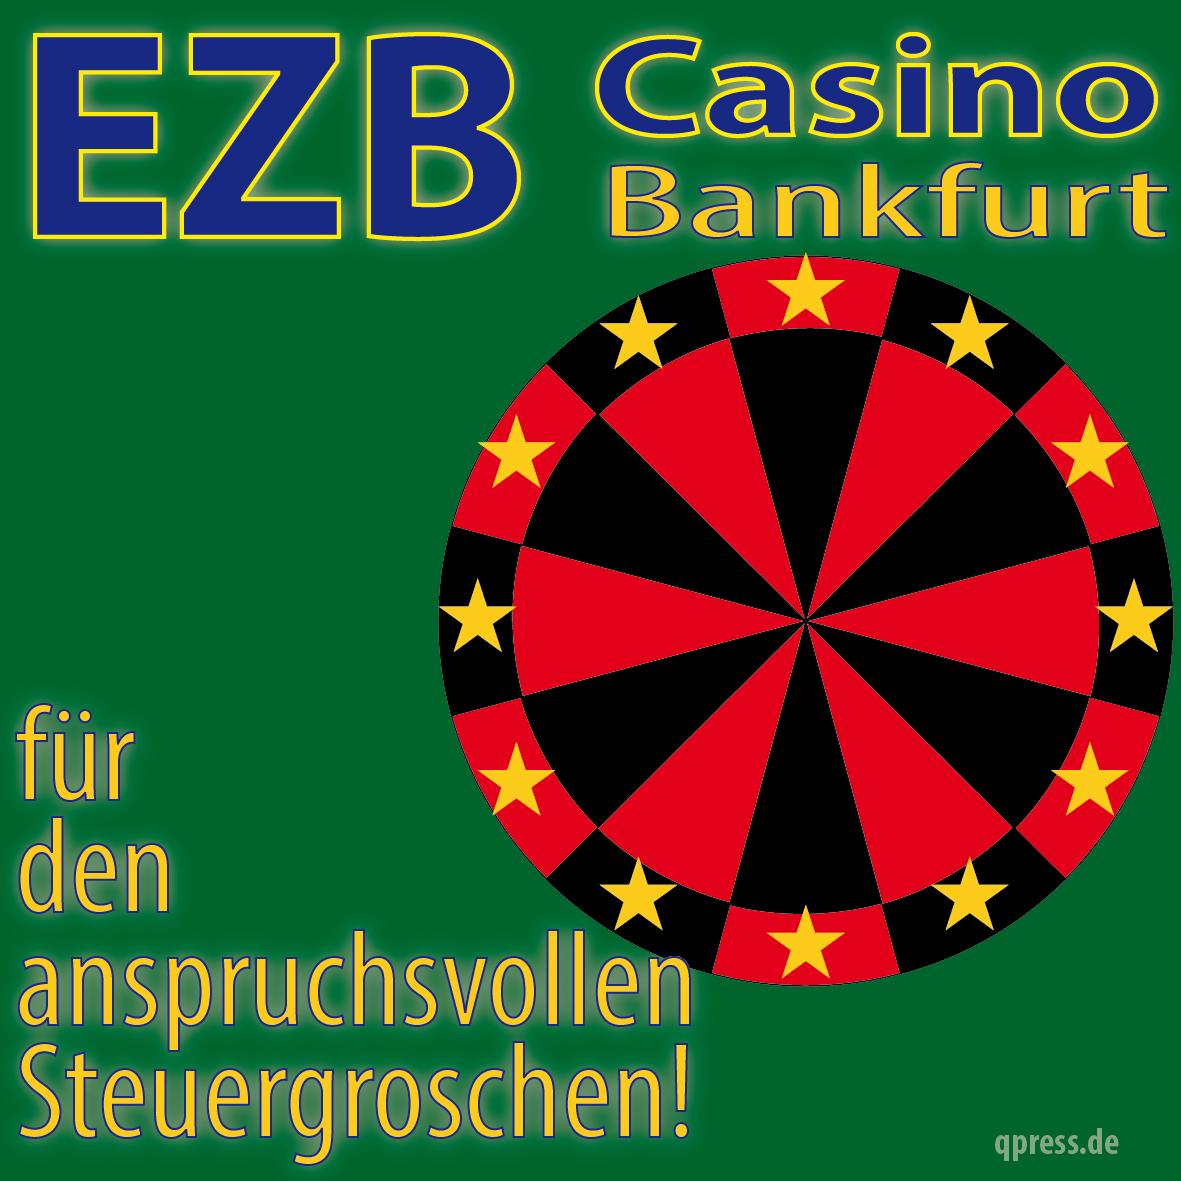 europas größtes casino